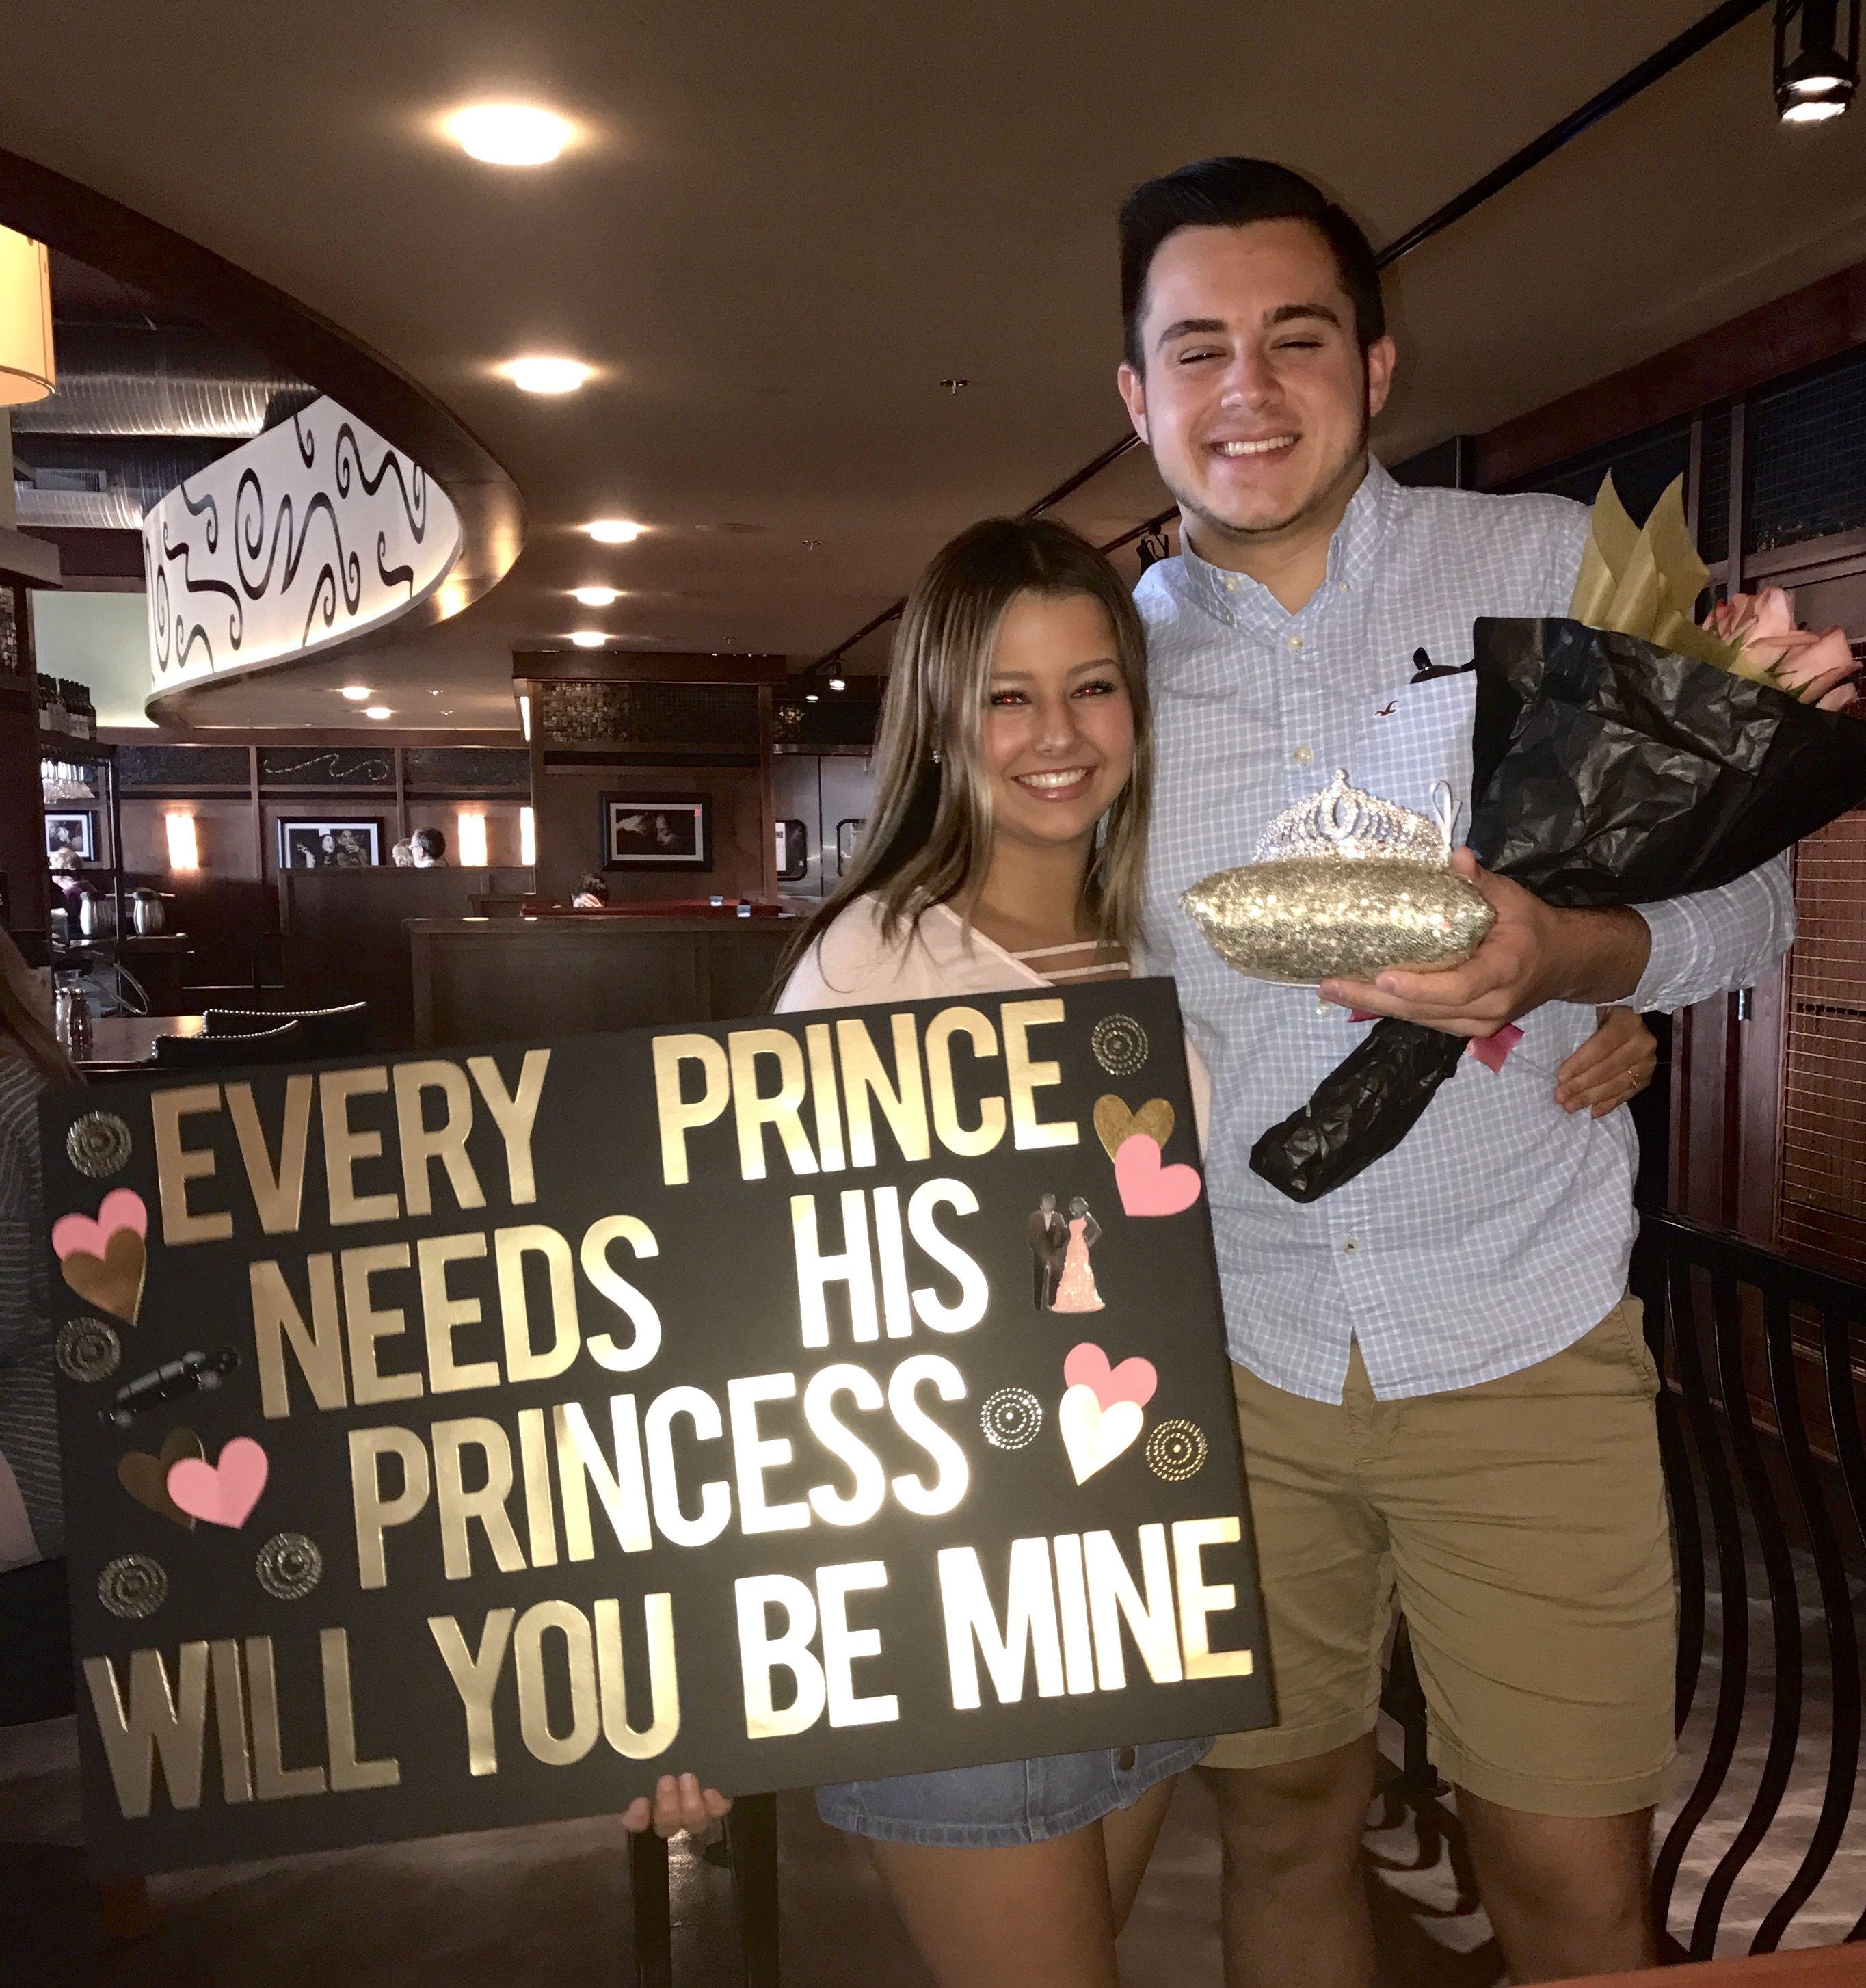 Princess Promposal. Cute Prom Promposal Ideas! Prom